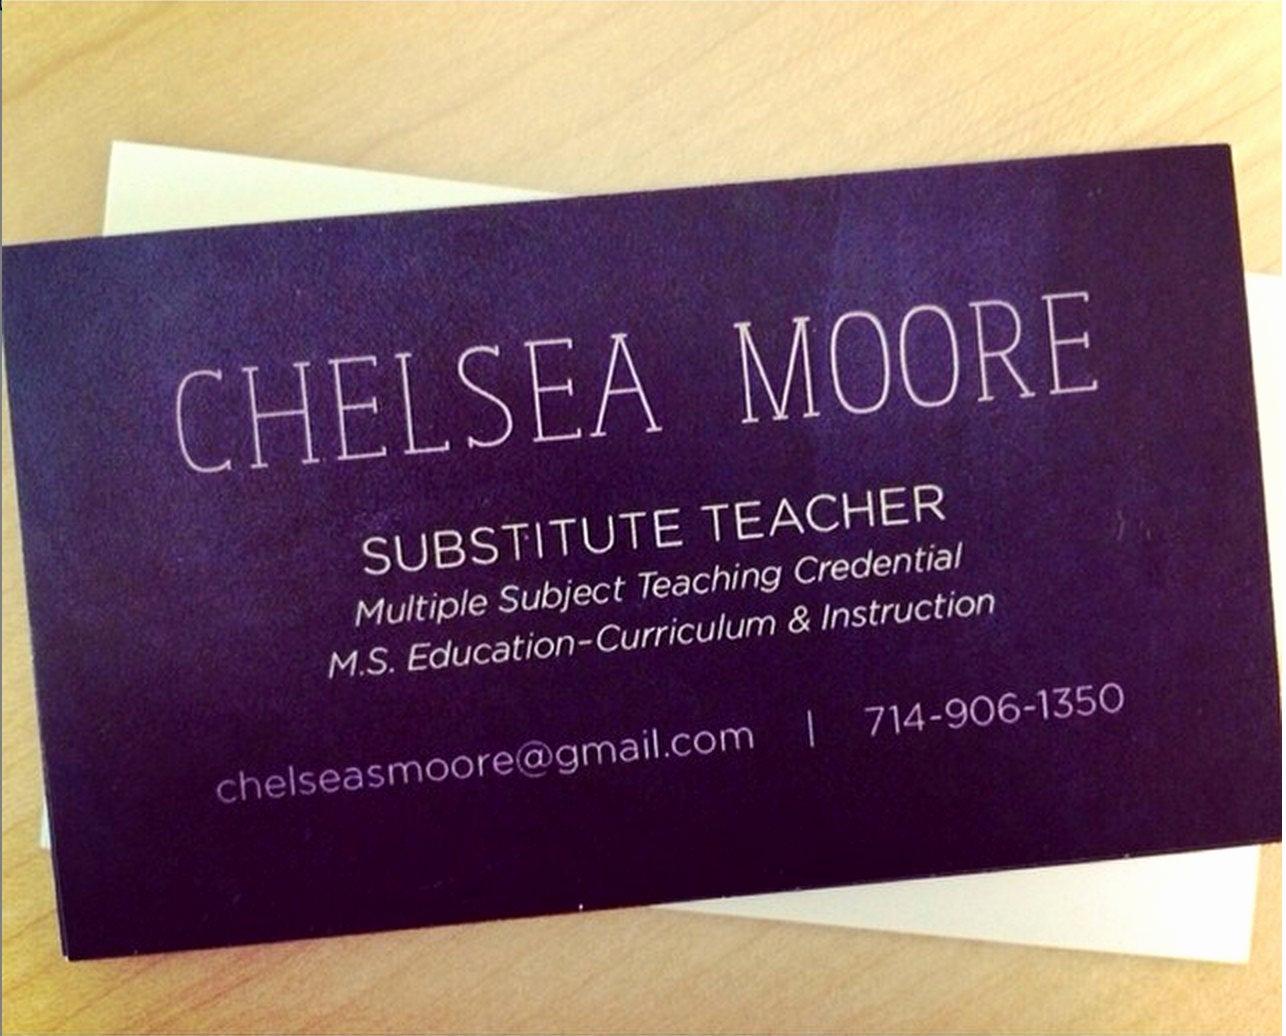 Substitute Teacher Business Cards Beautiful Teacher Substitute Teacher or Tutor Chalkboard Business Card